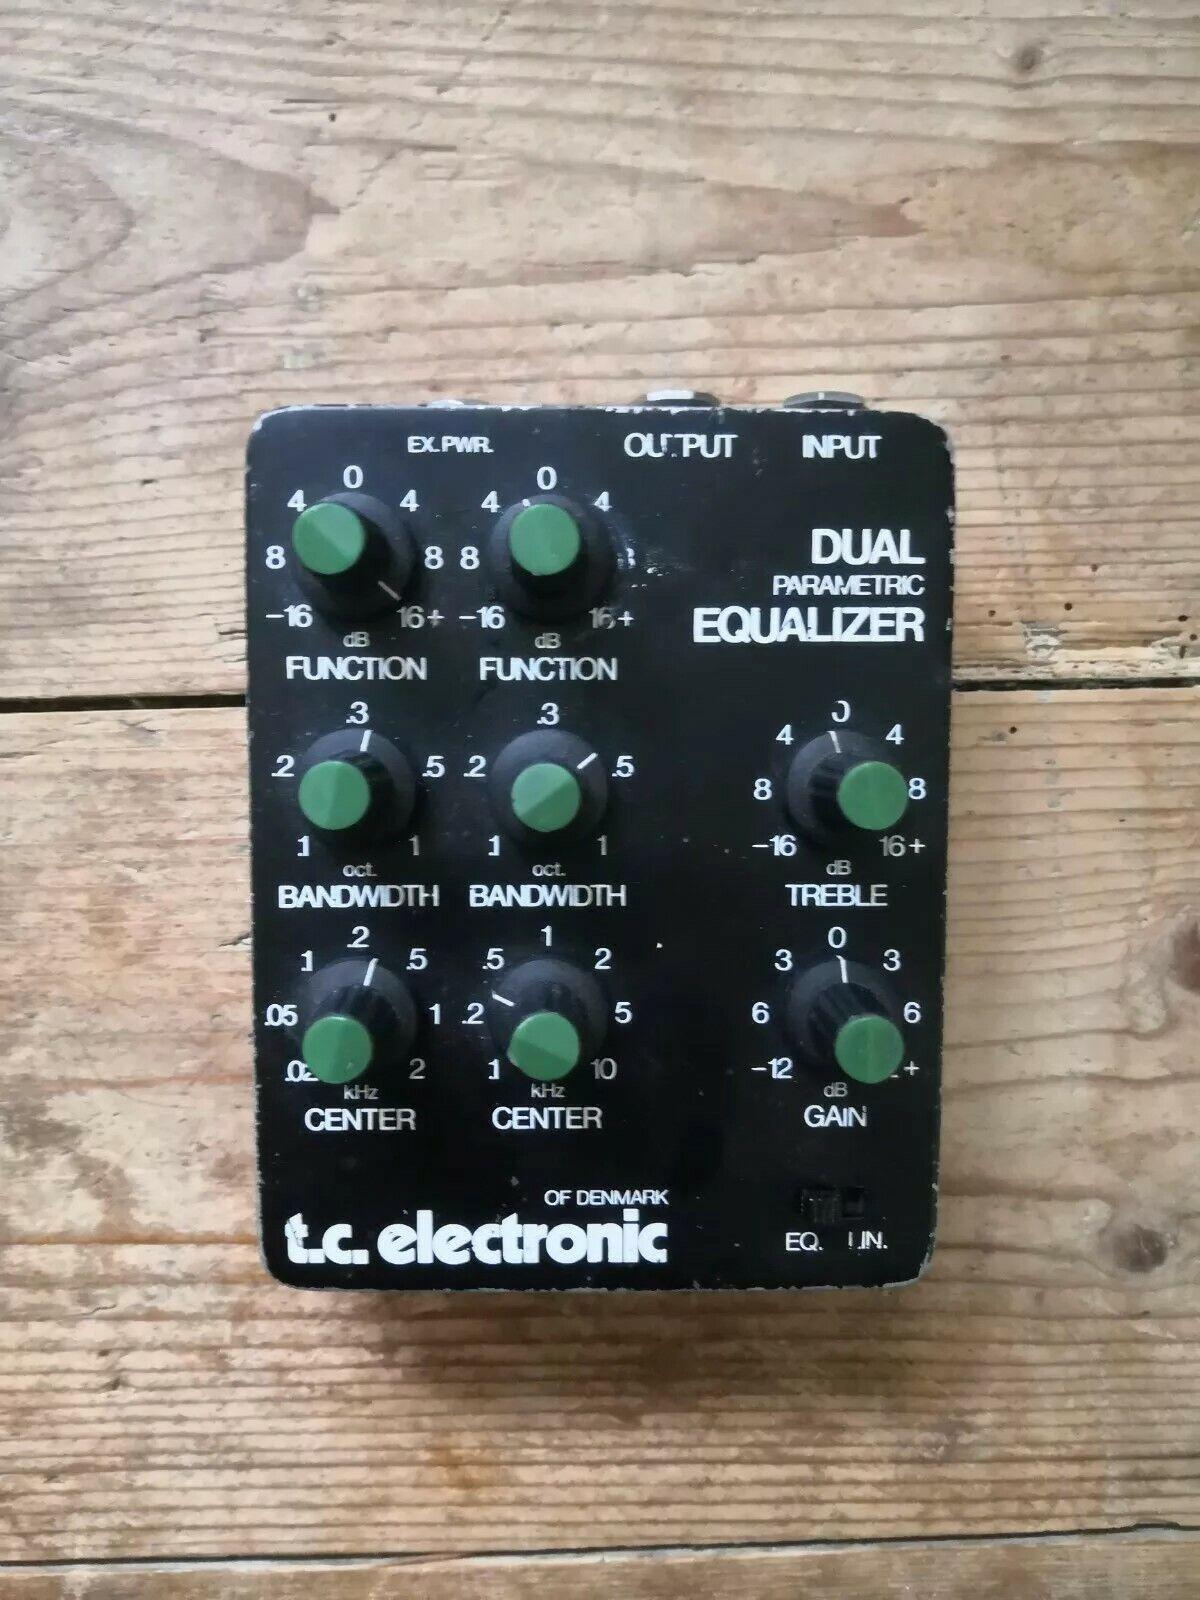 TC electronic dual parametric EQ equalizer guitar effects pedal